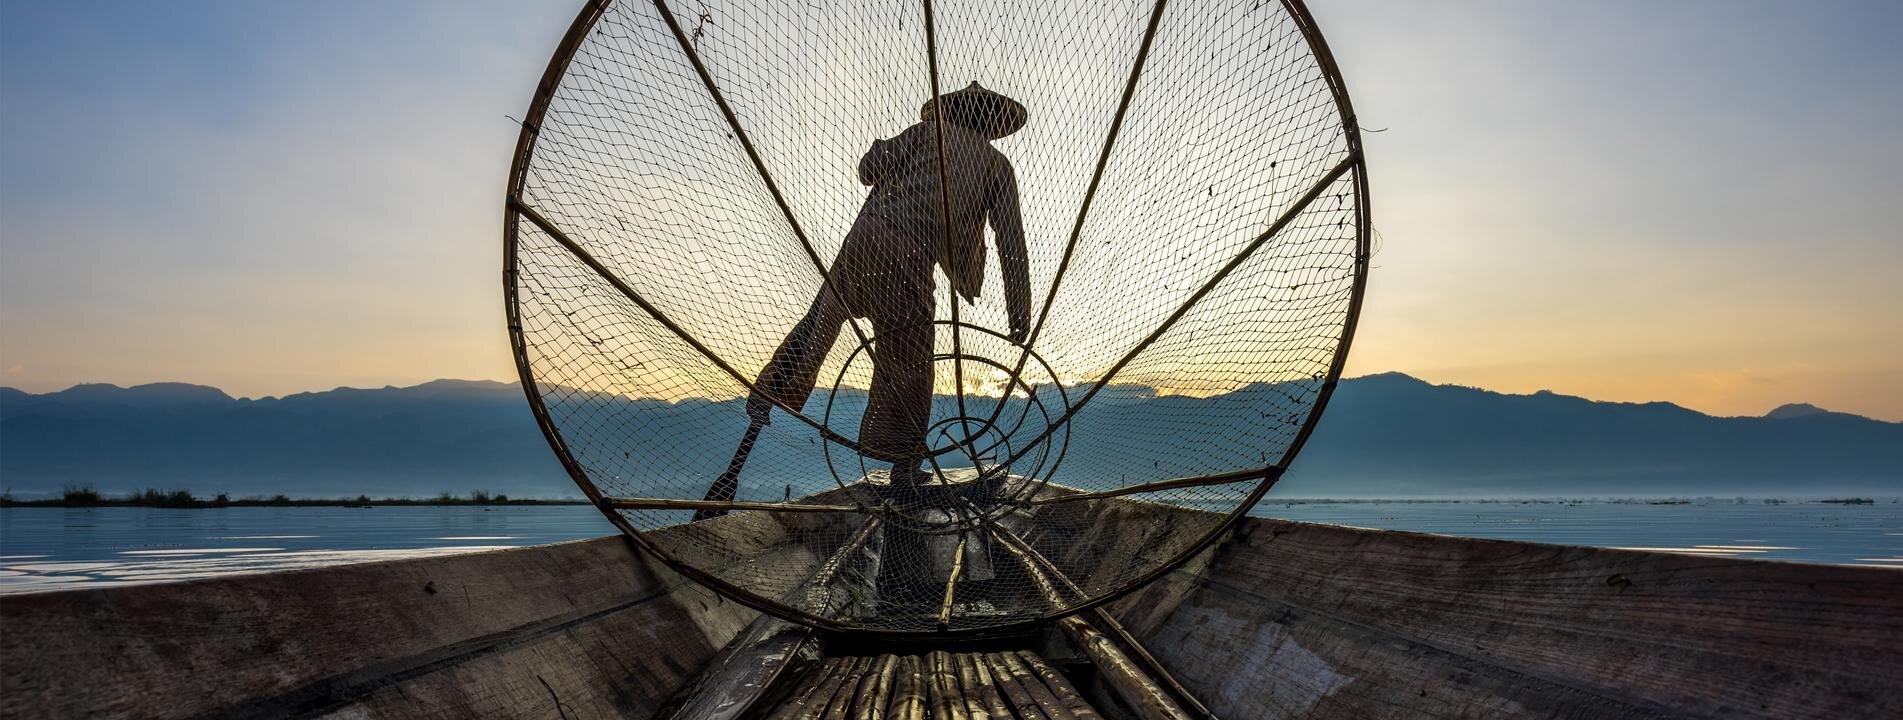 A local fisherman of Inle Lake